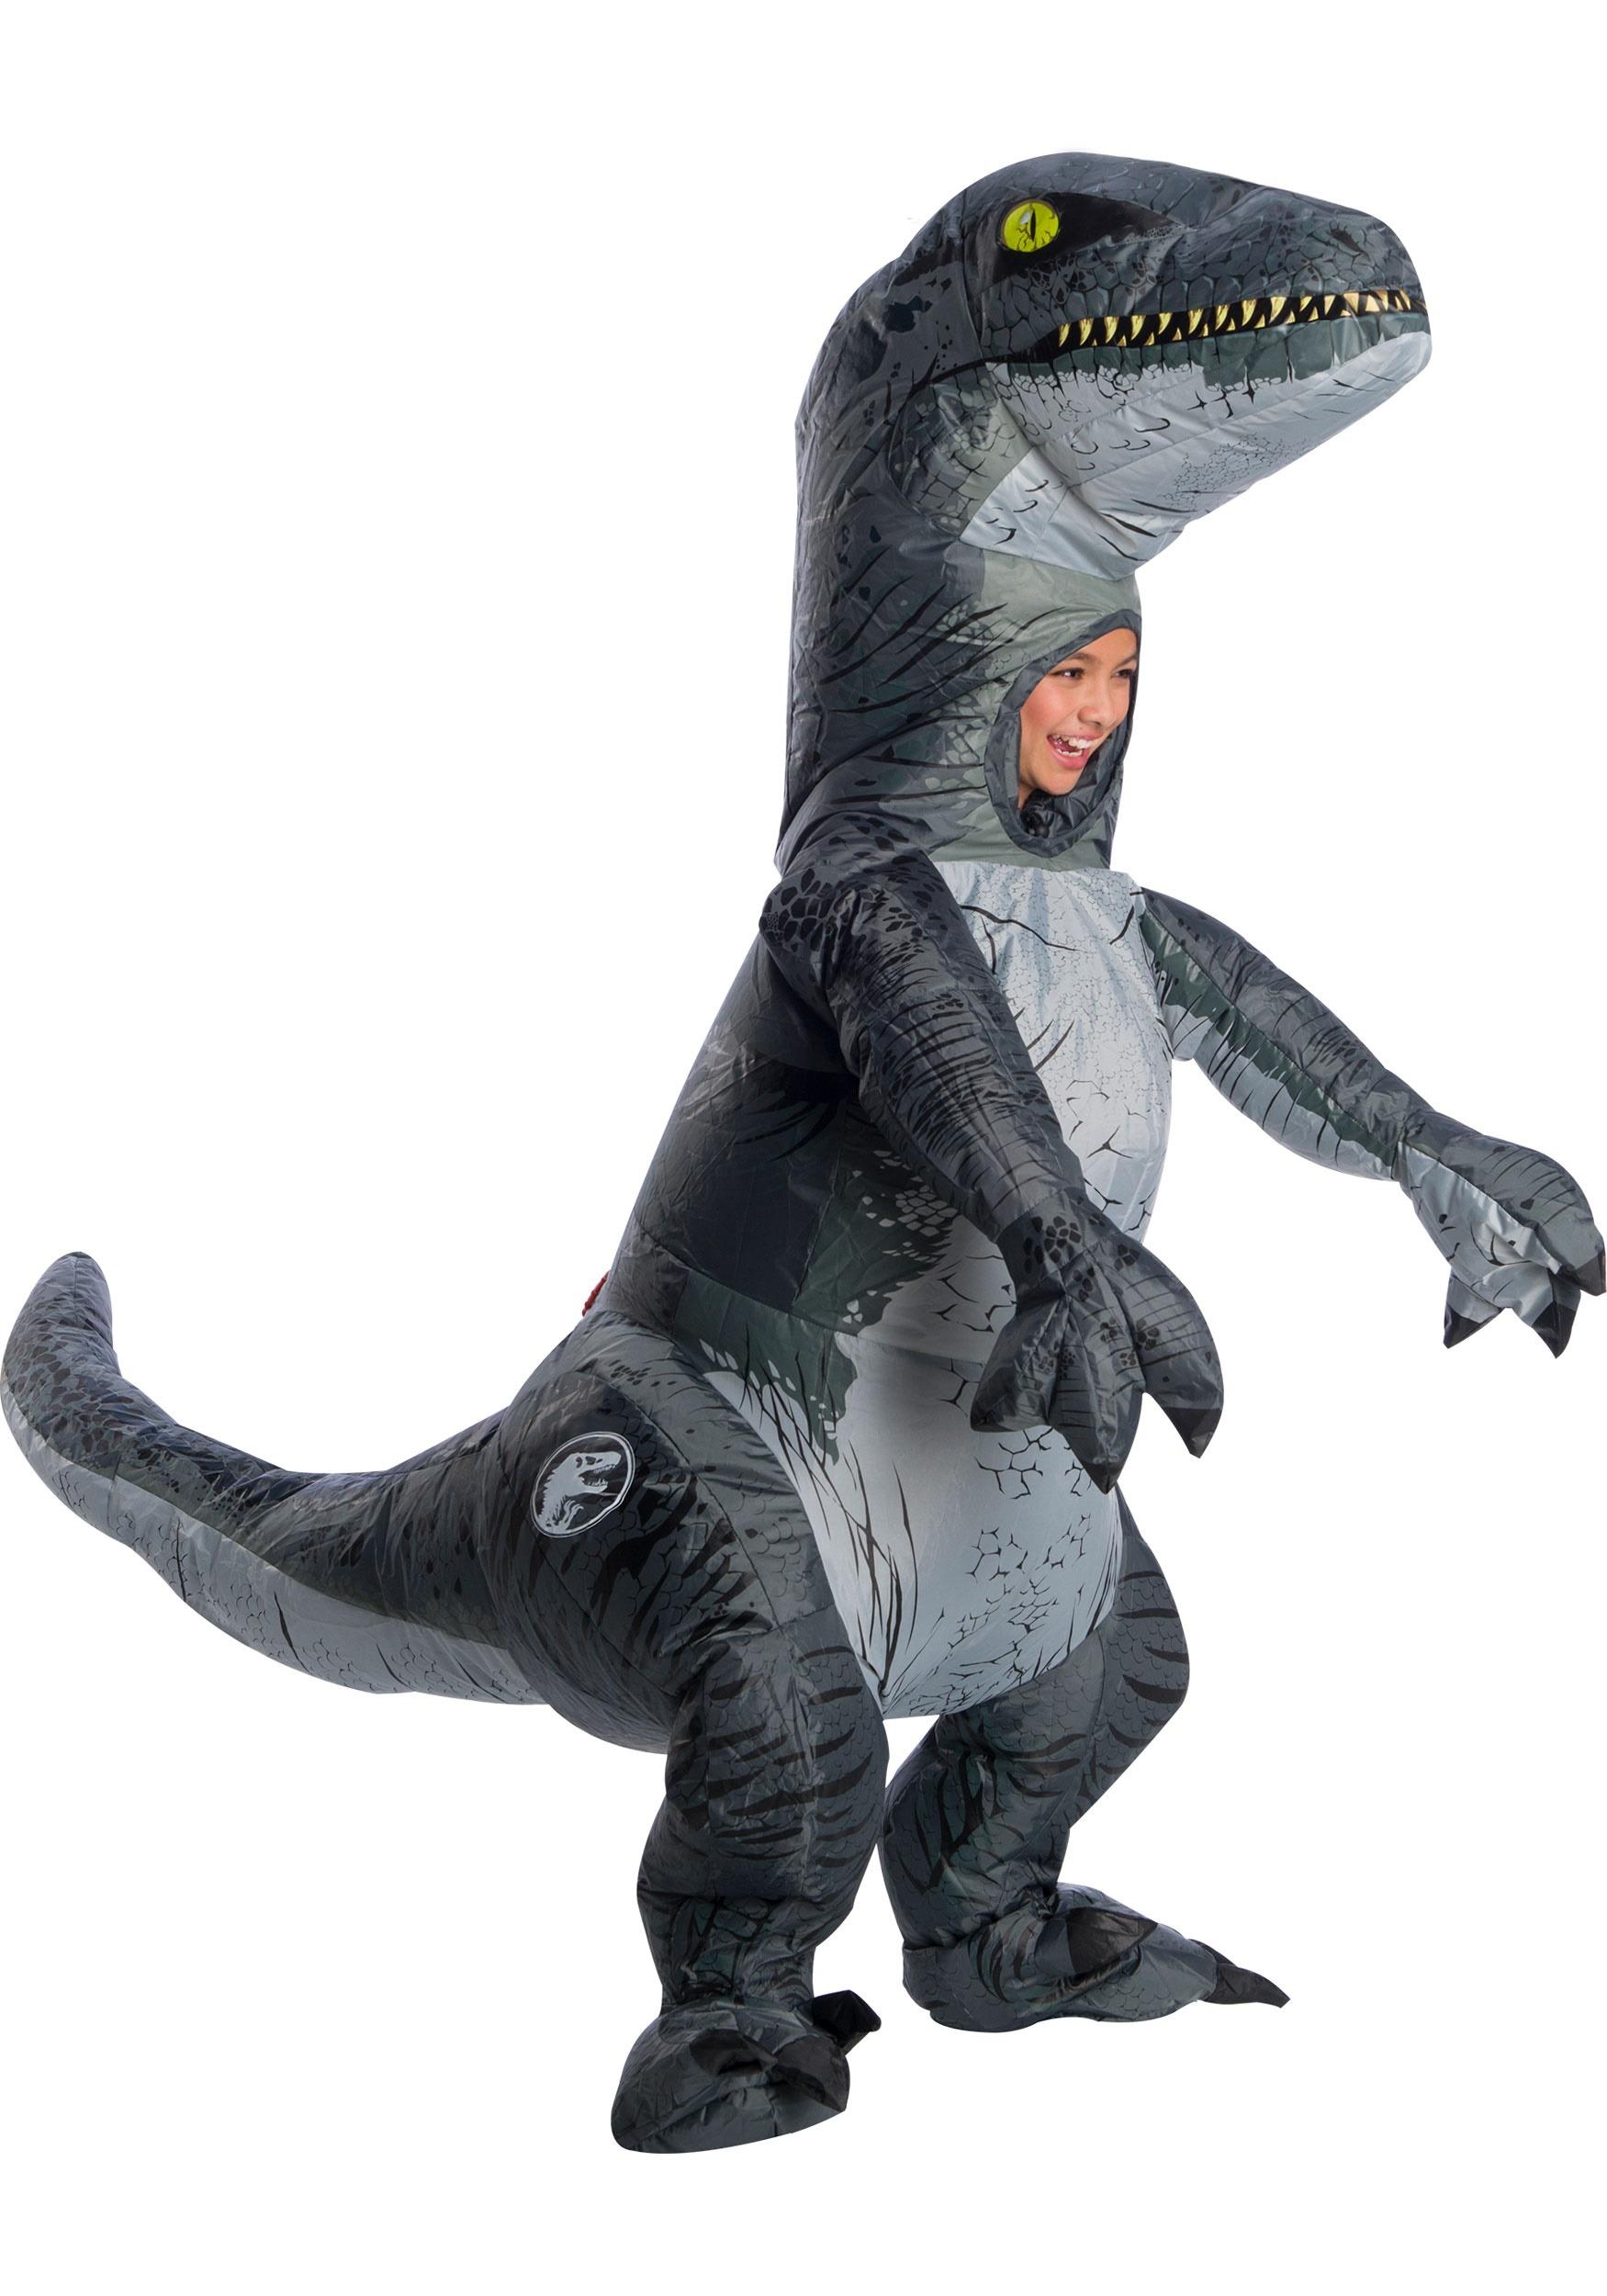 Jurassic World 2 Child Inflatable